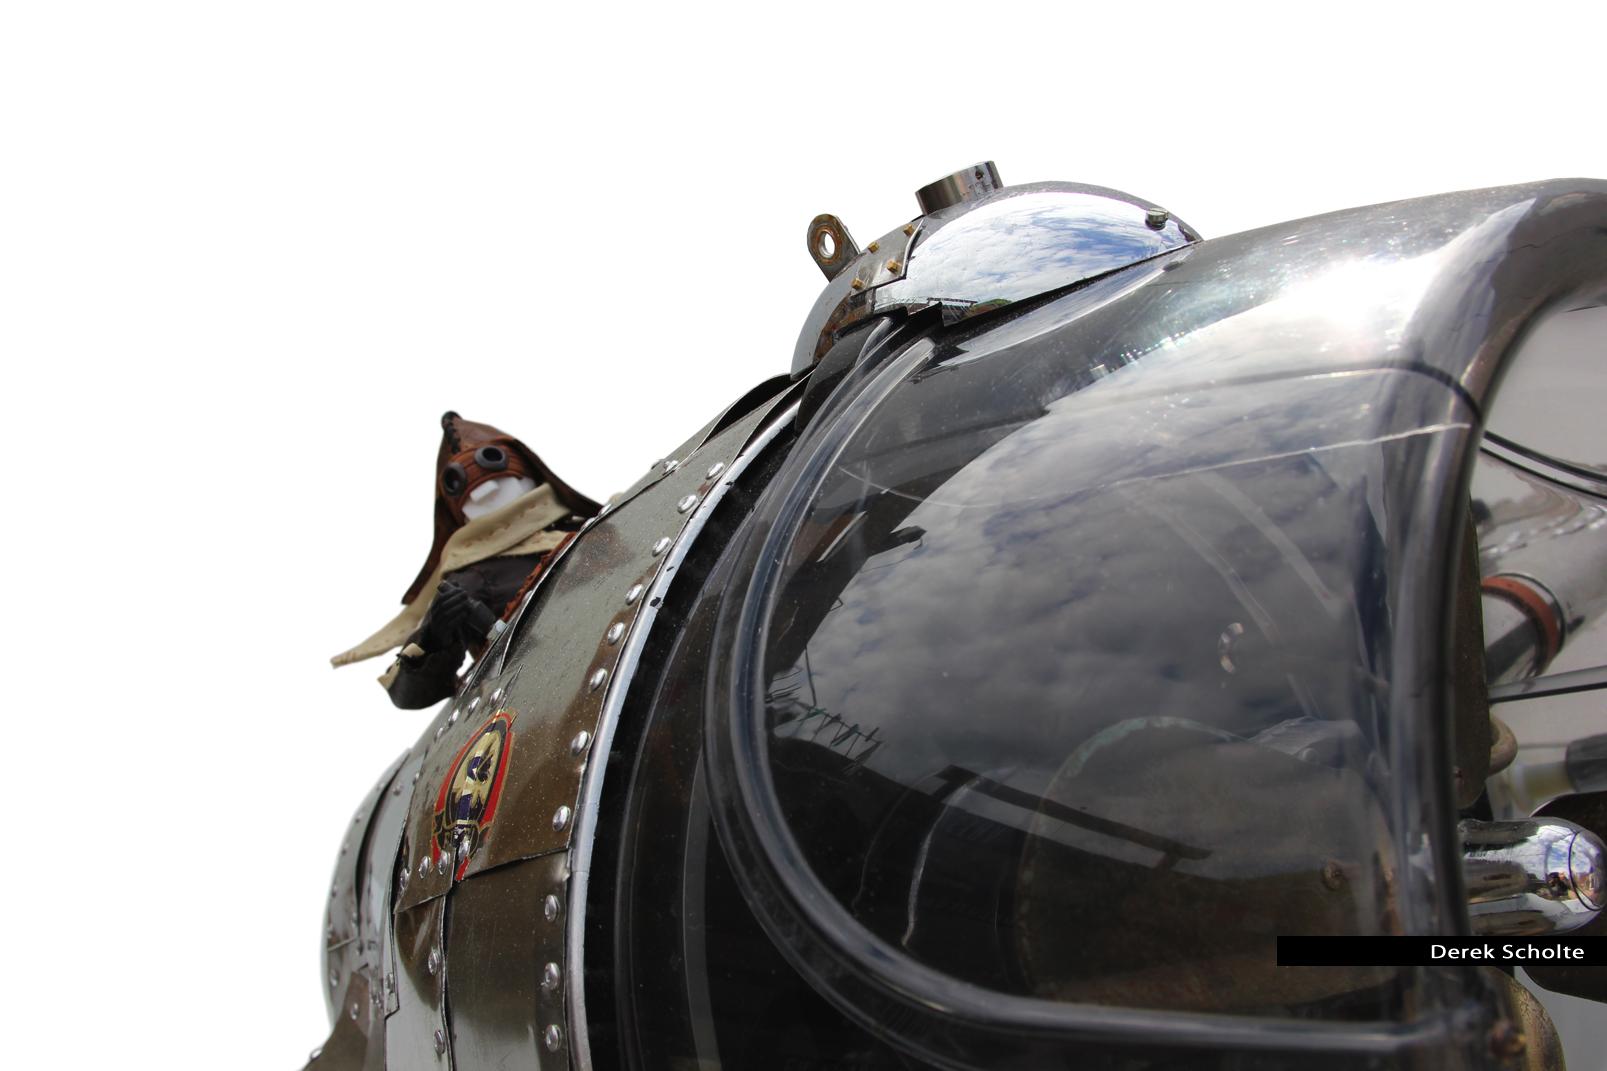 Linnaeus' Aeroplane - Dieselpunk airplane